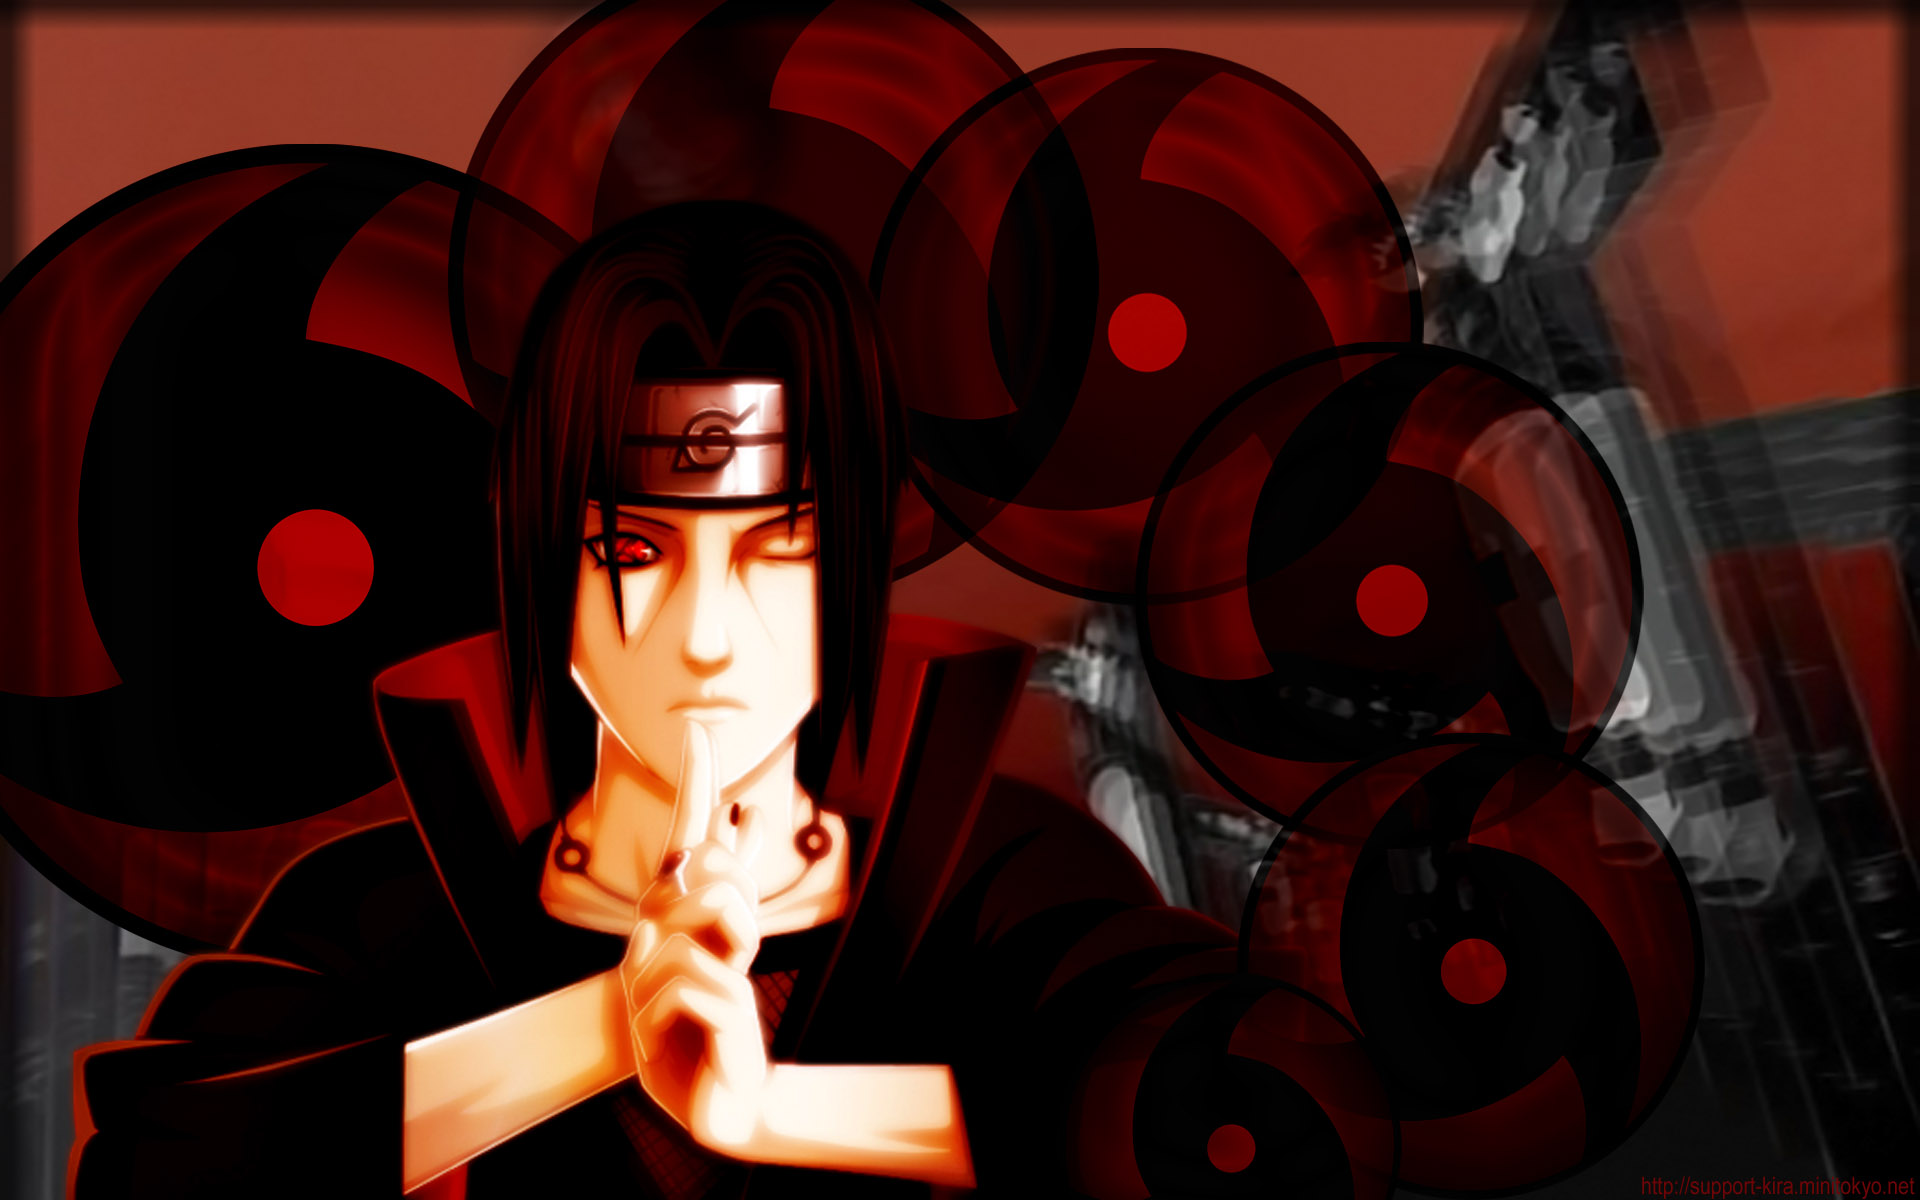 Hd Wallpapers Naruto - Itachi 1080 X 1080 - HD Wallpaper